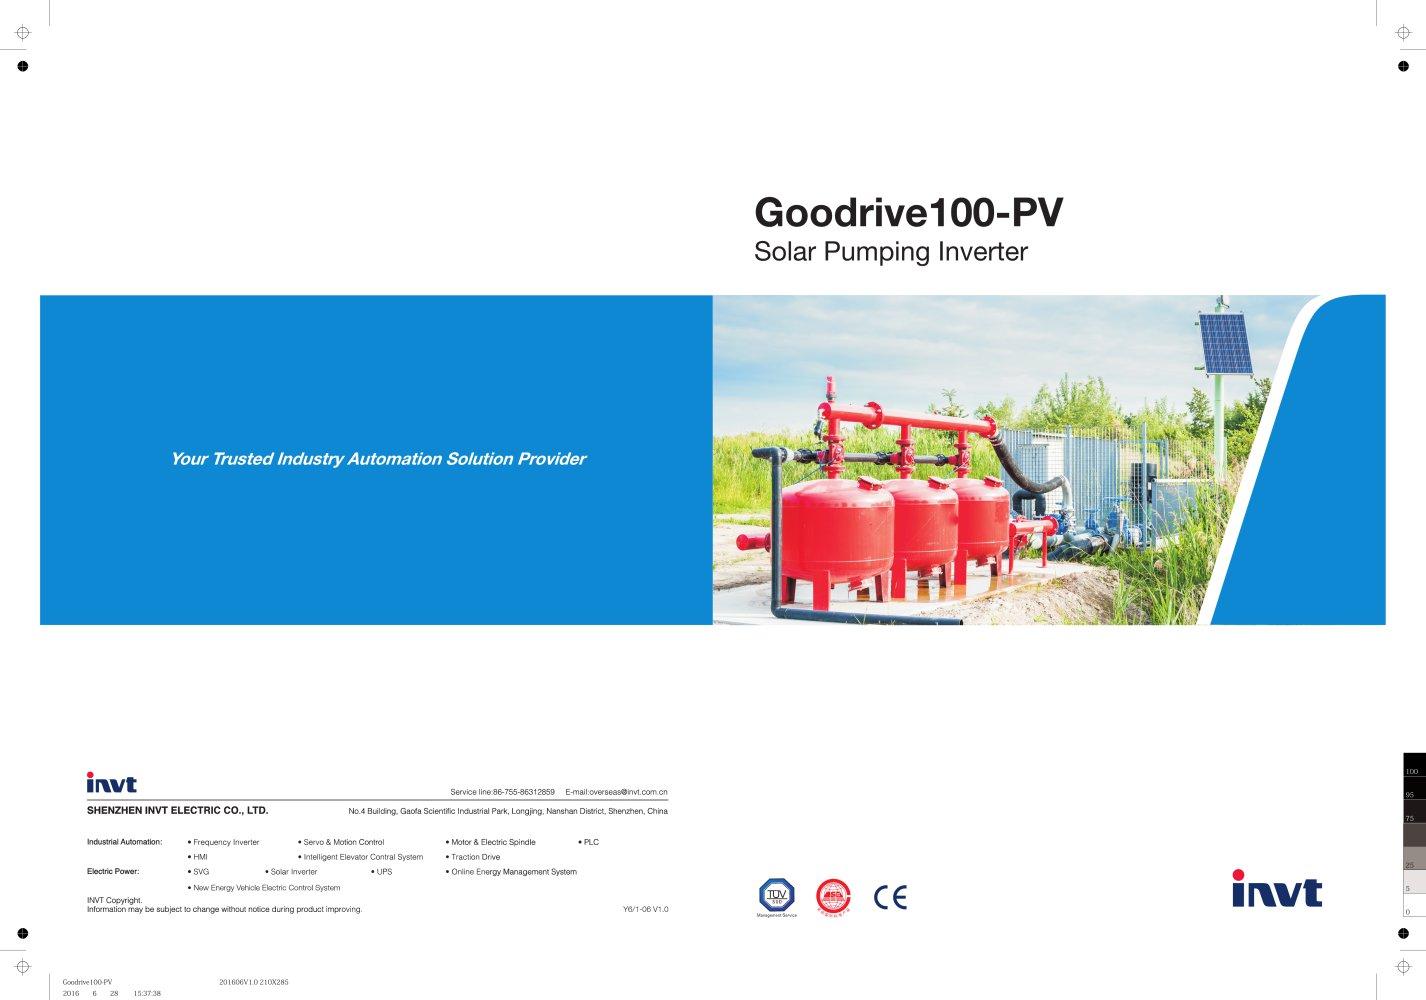 Invt Gd100 Pv Series Solar Pump Inverter Product Manual Shenzhen Ups Circuit Diagram Urdu 1 10 Pages